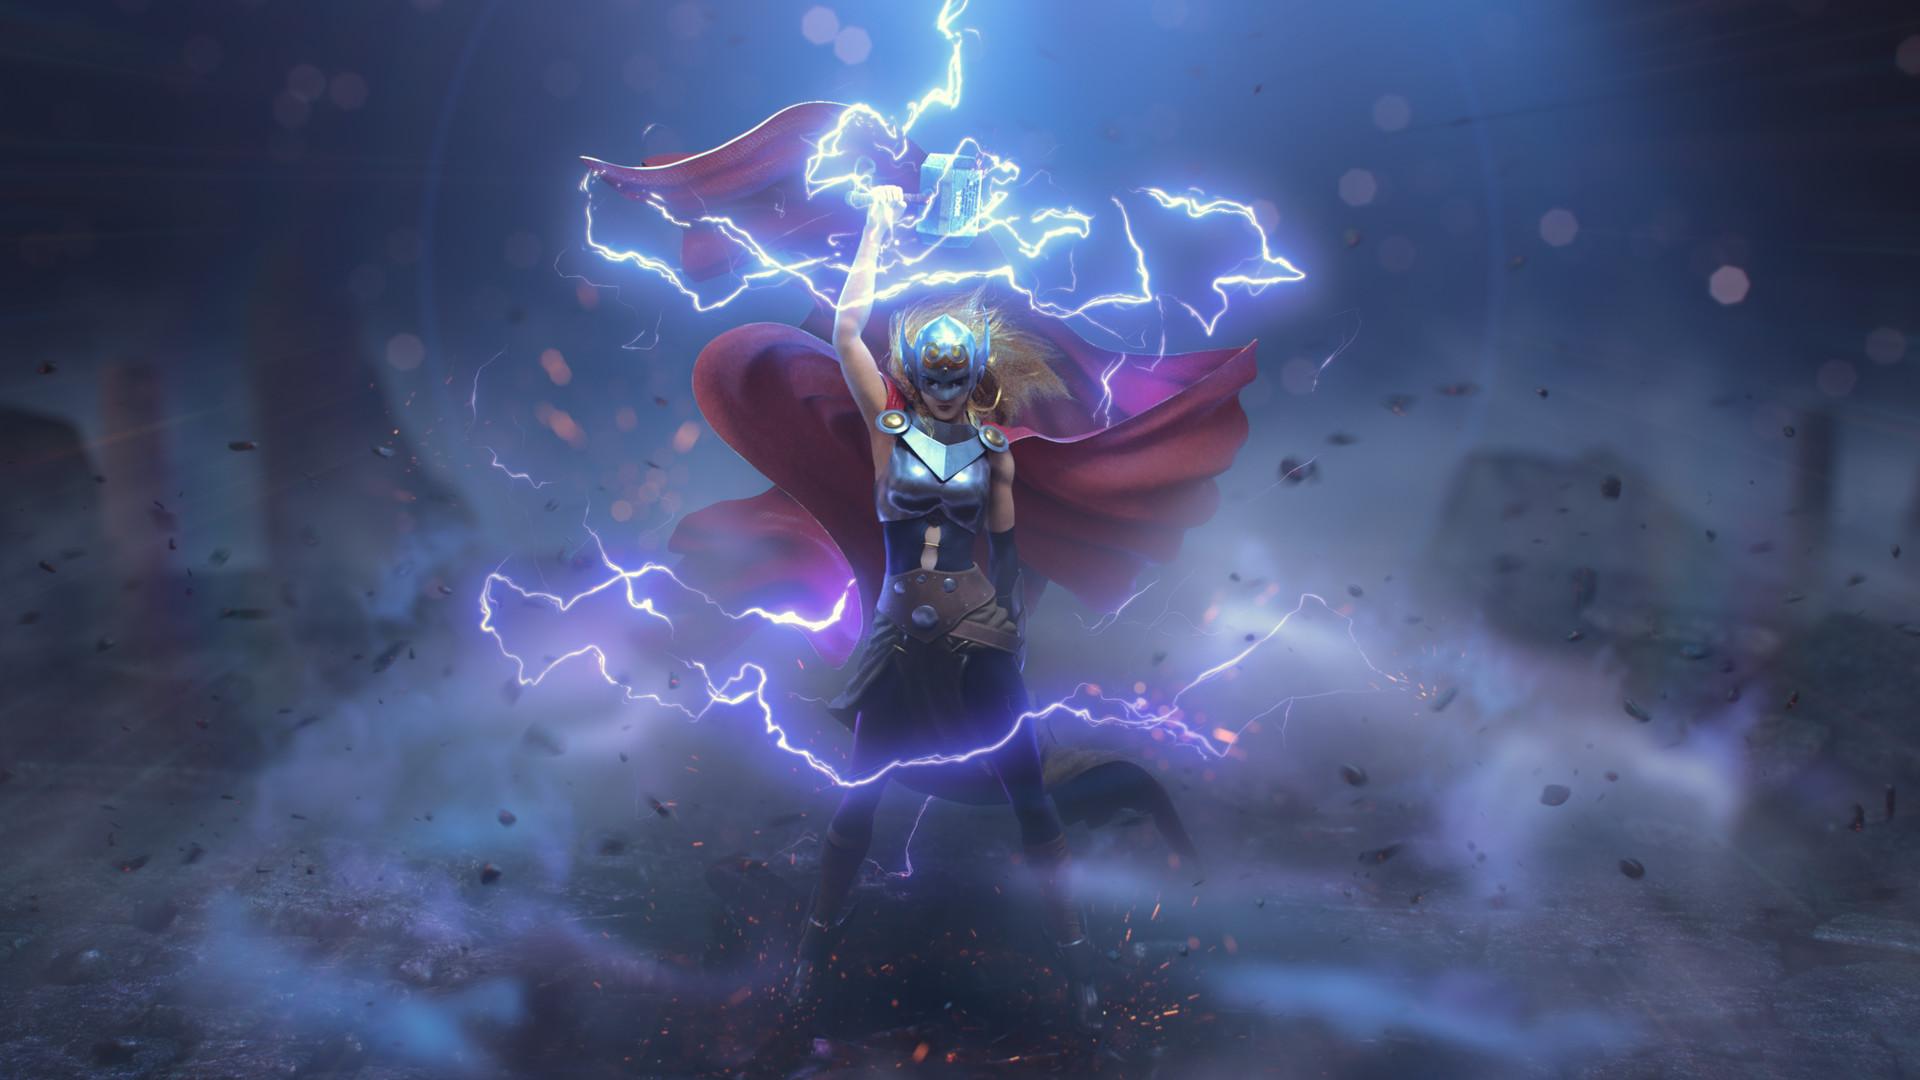 General 1920x1080 artwork fantasy art Thor lightning Mjolnir women cape mythology Norse mythology Jane Foster